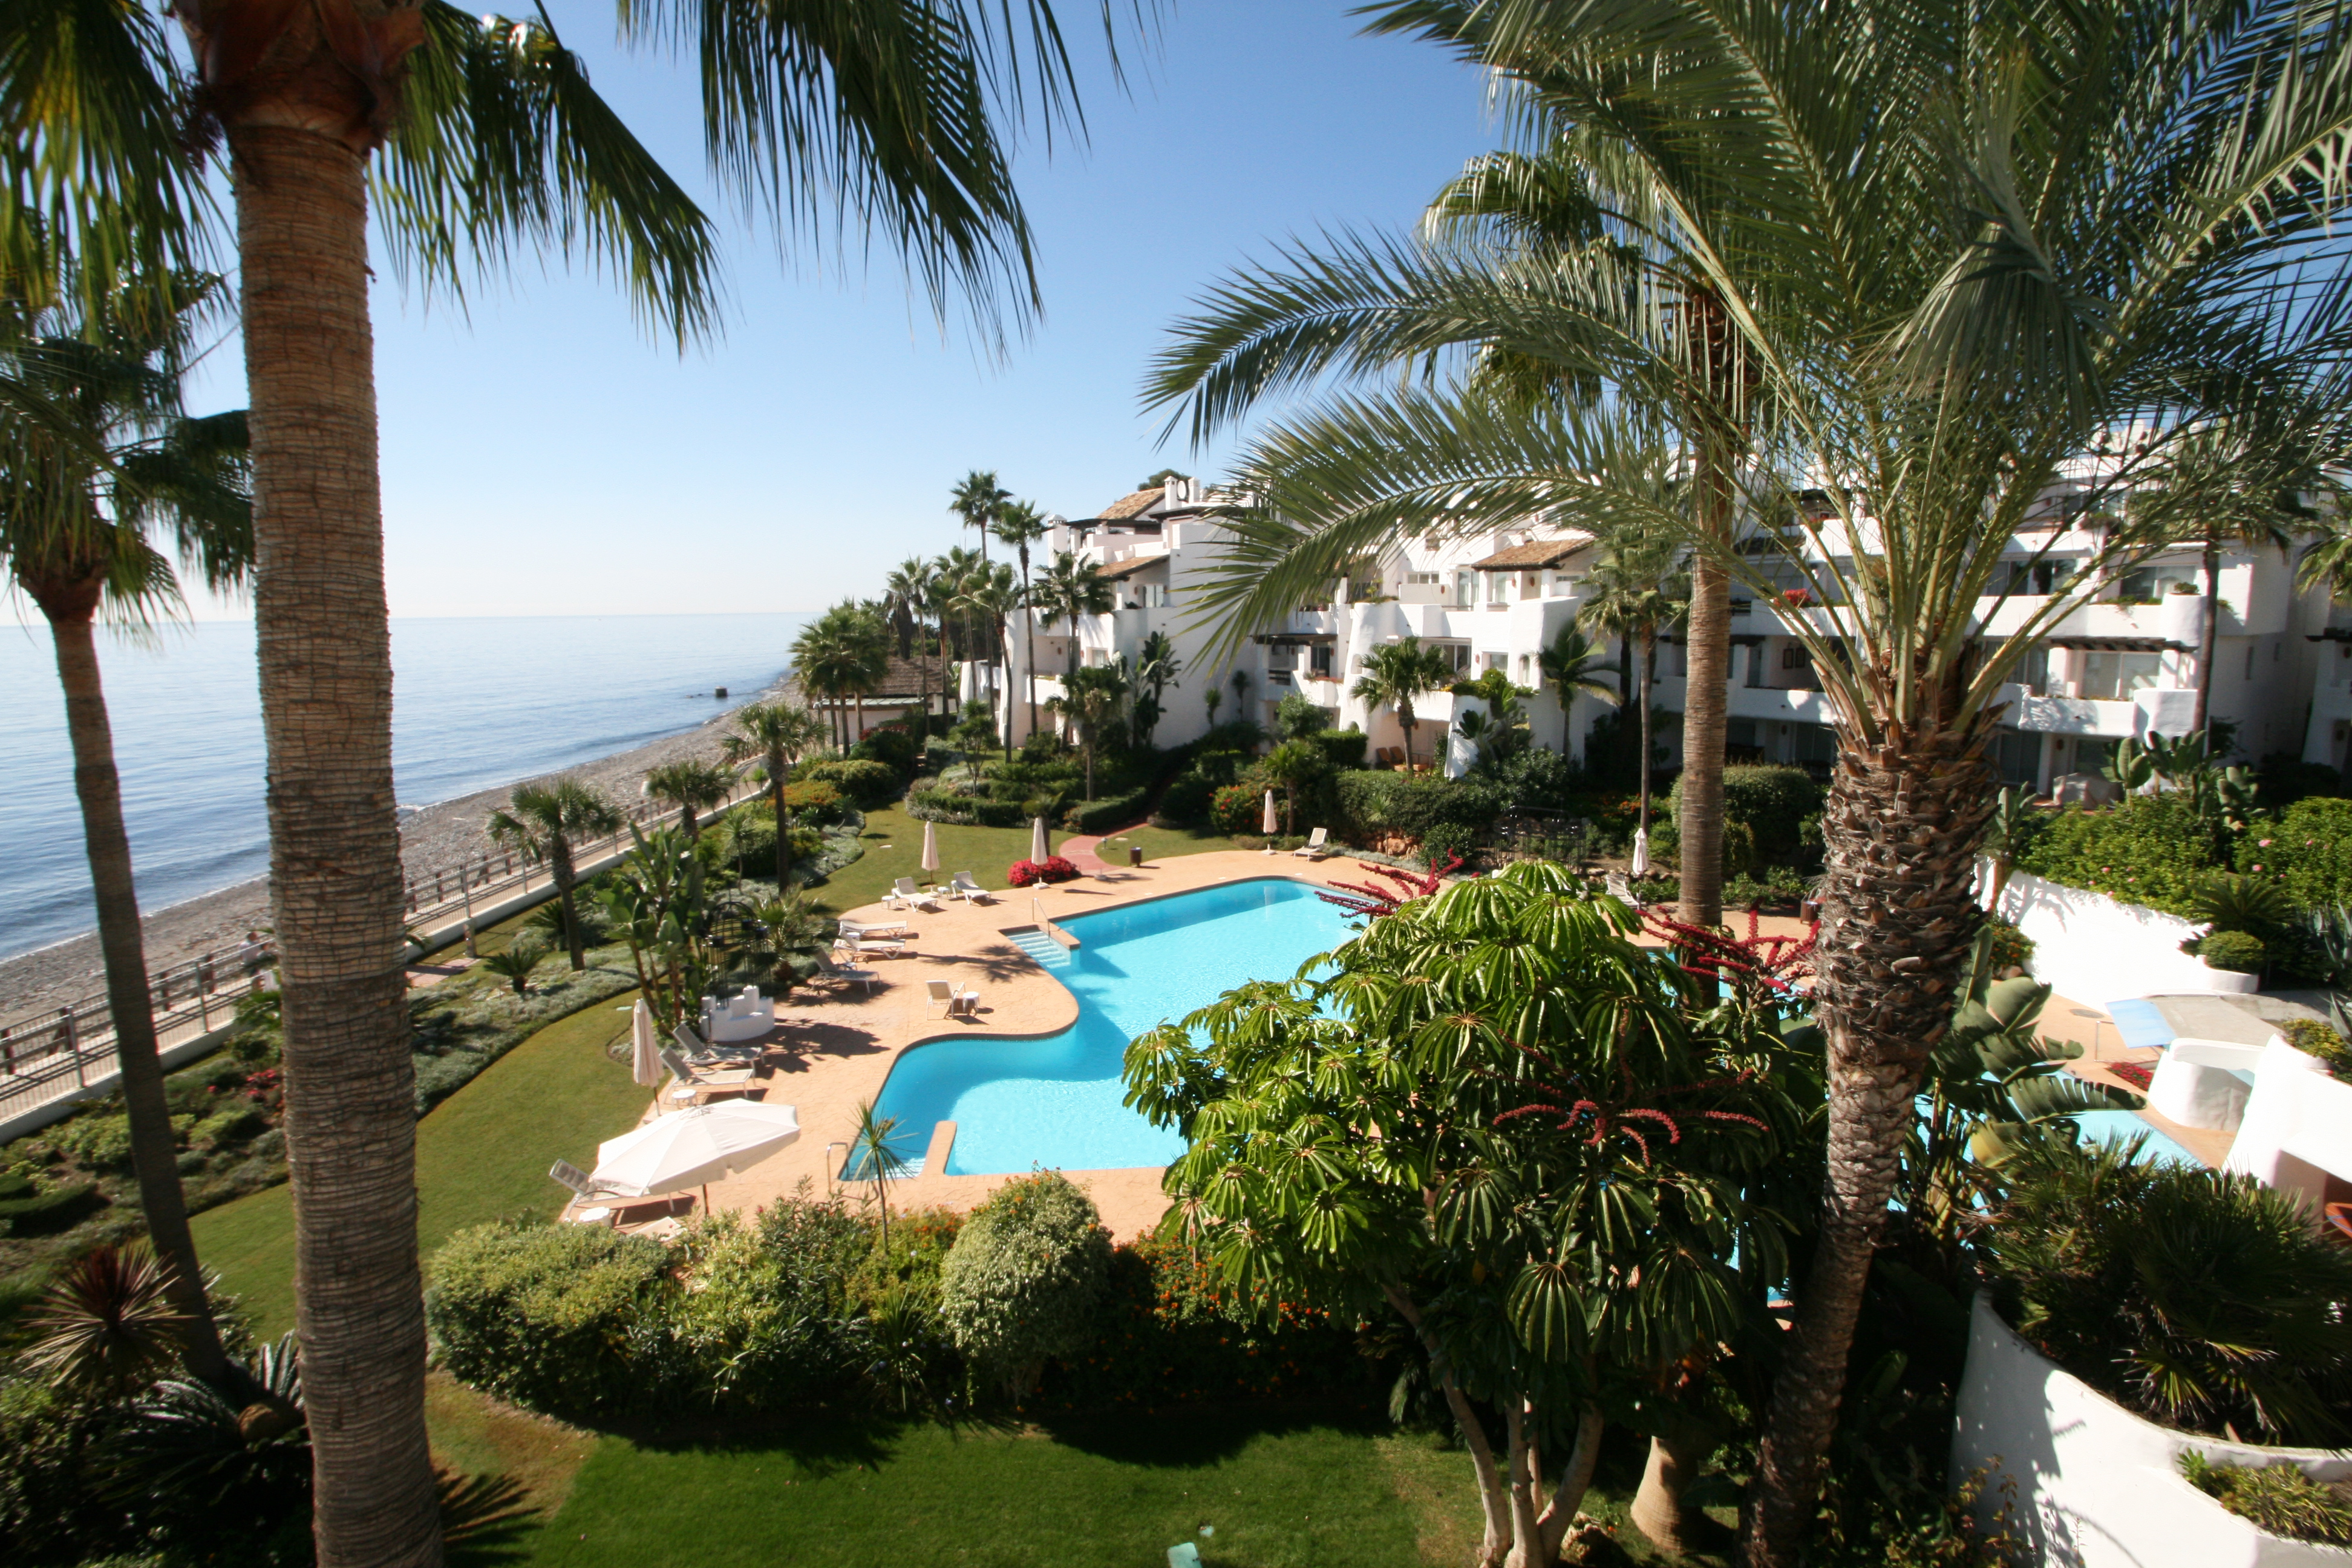 Beachside apartments in Marbella